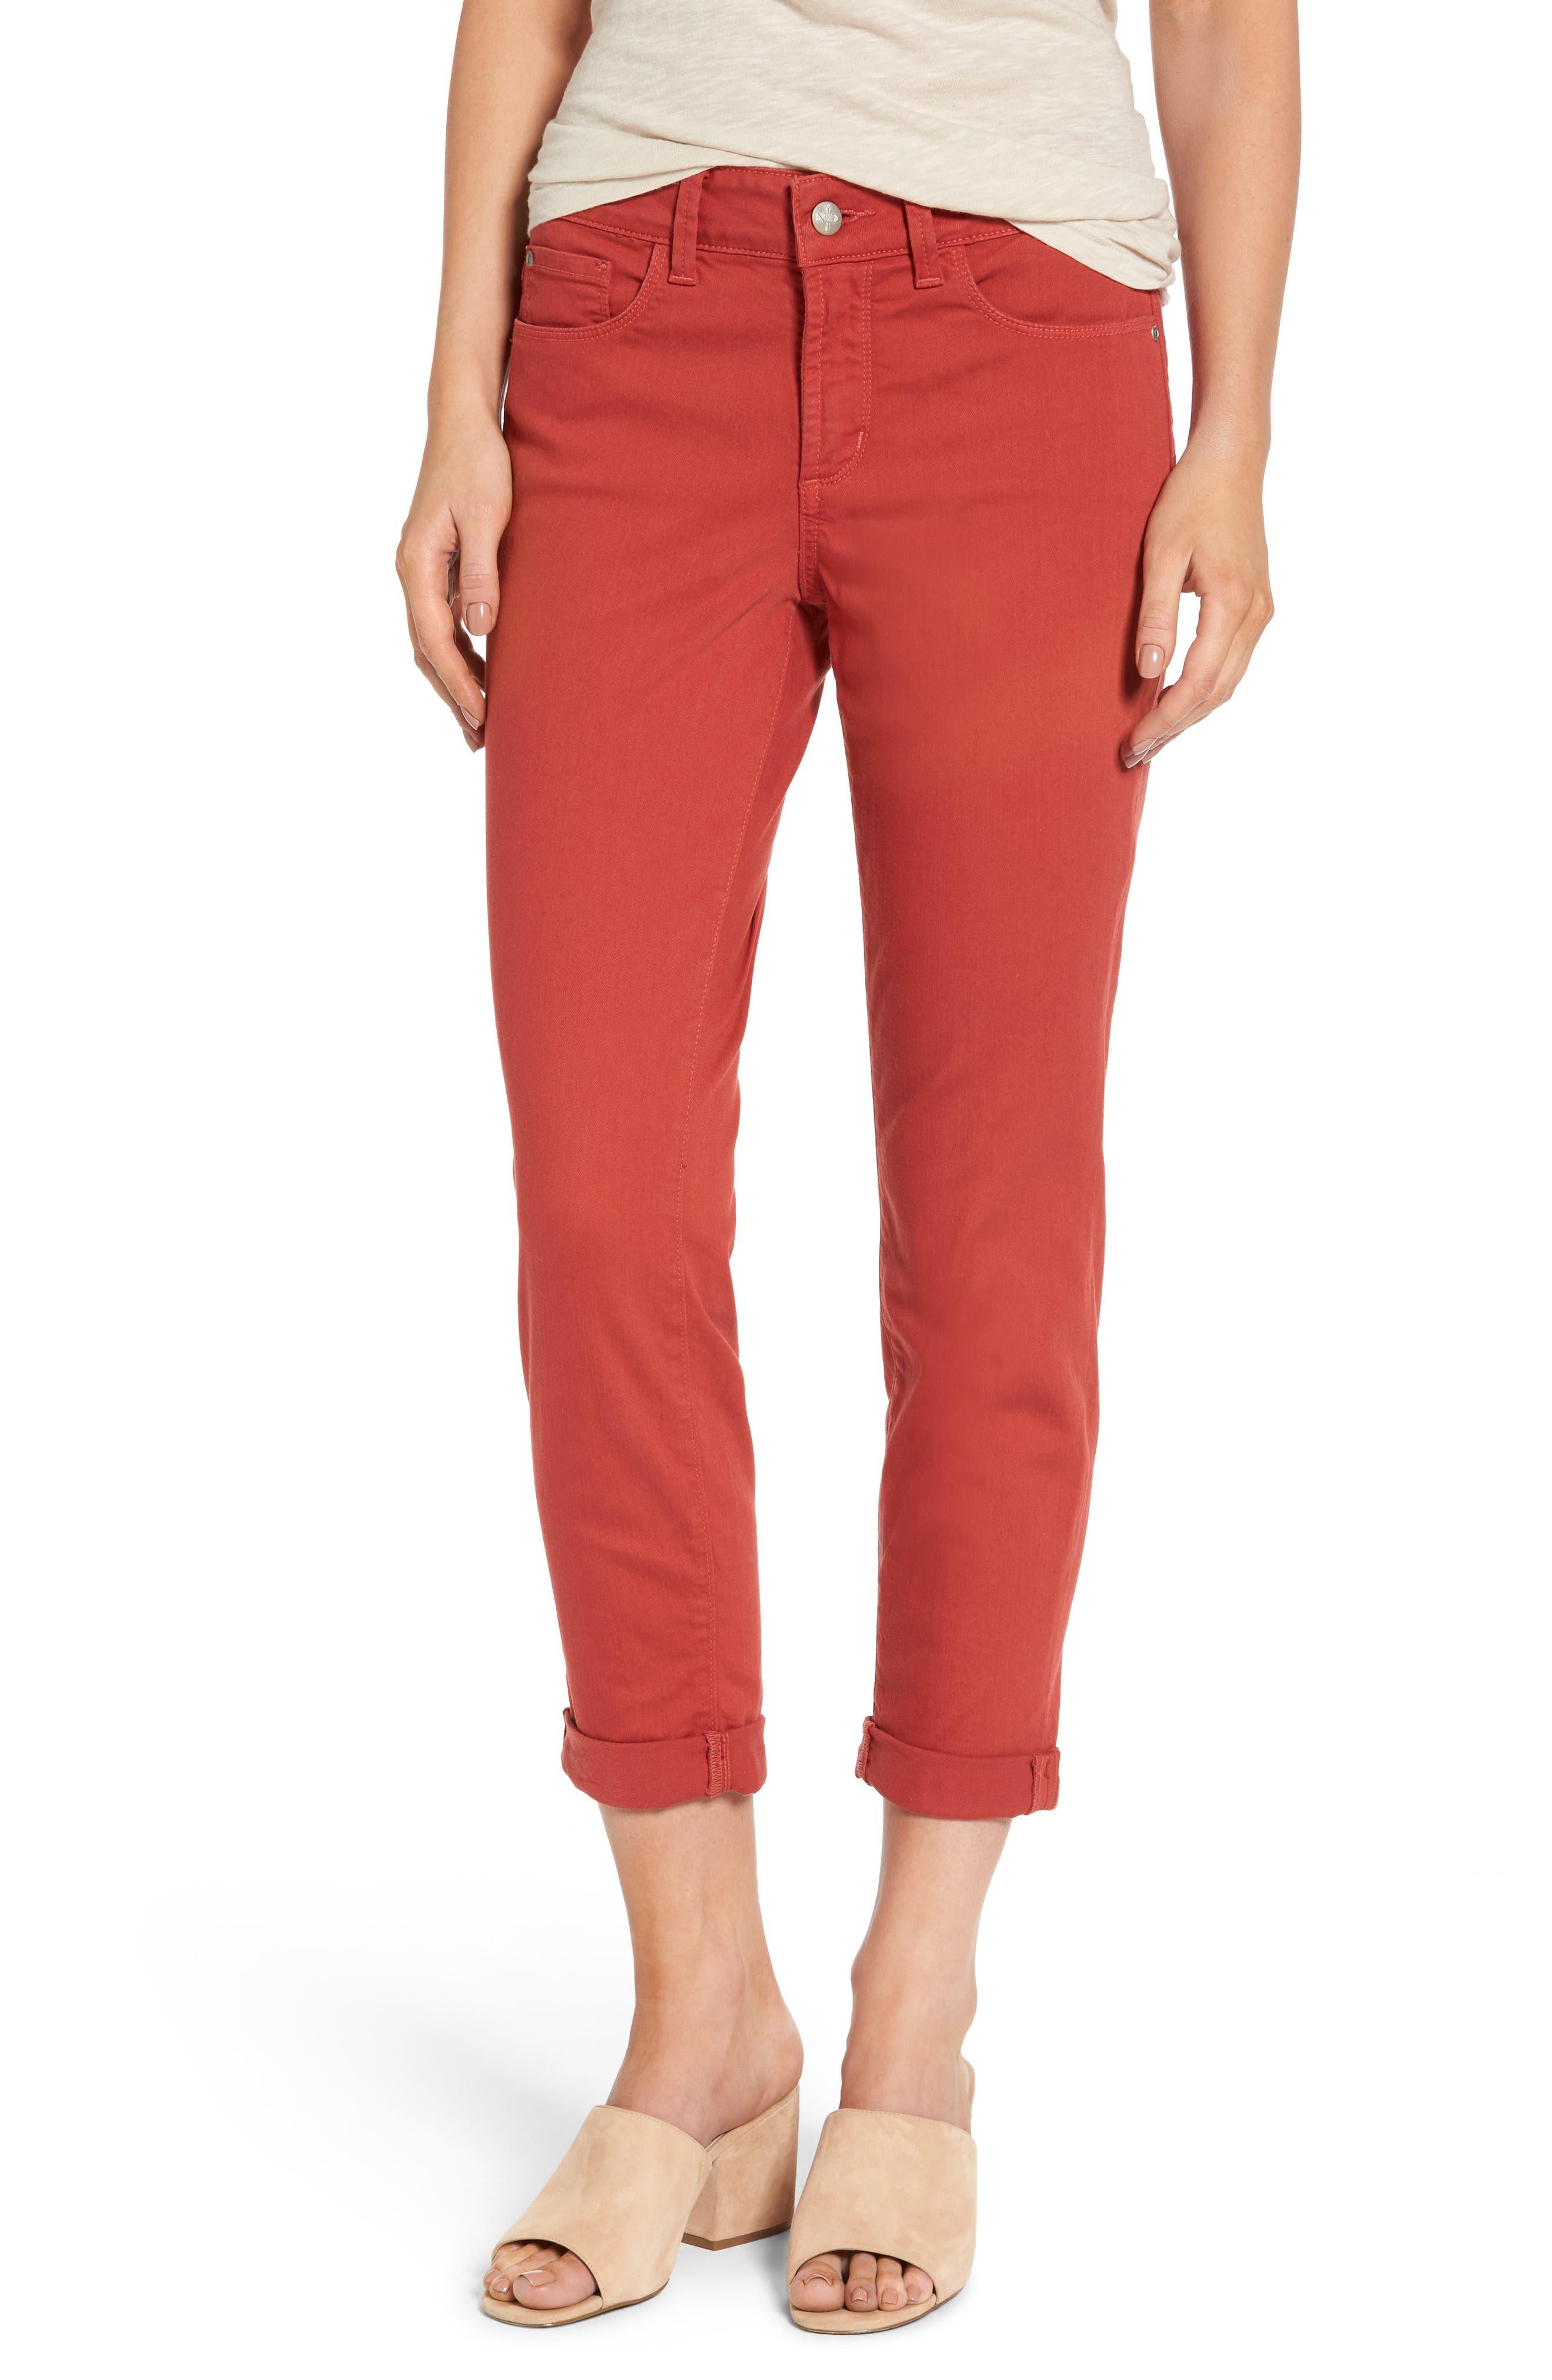 Main Image - NYDJ Alina Convertible Ankle Jeans (Regular & Petite)